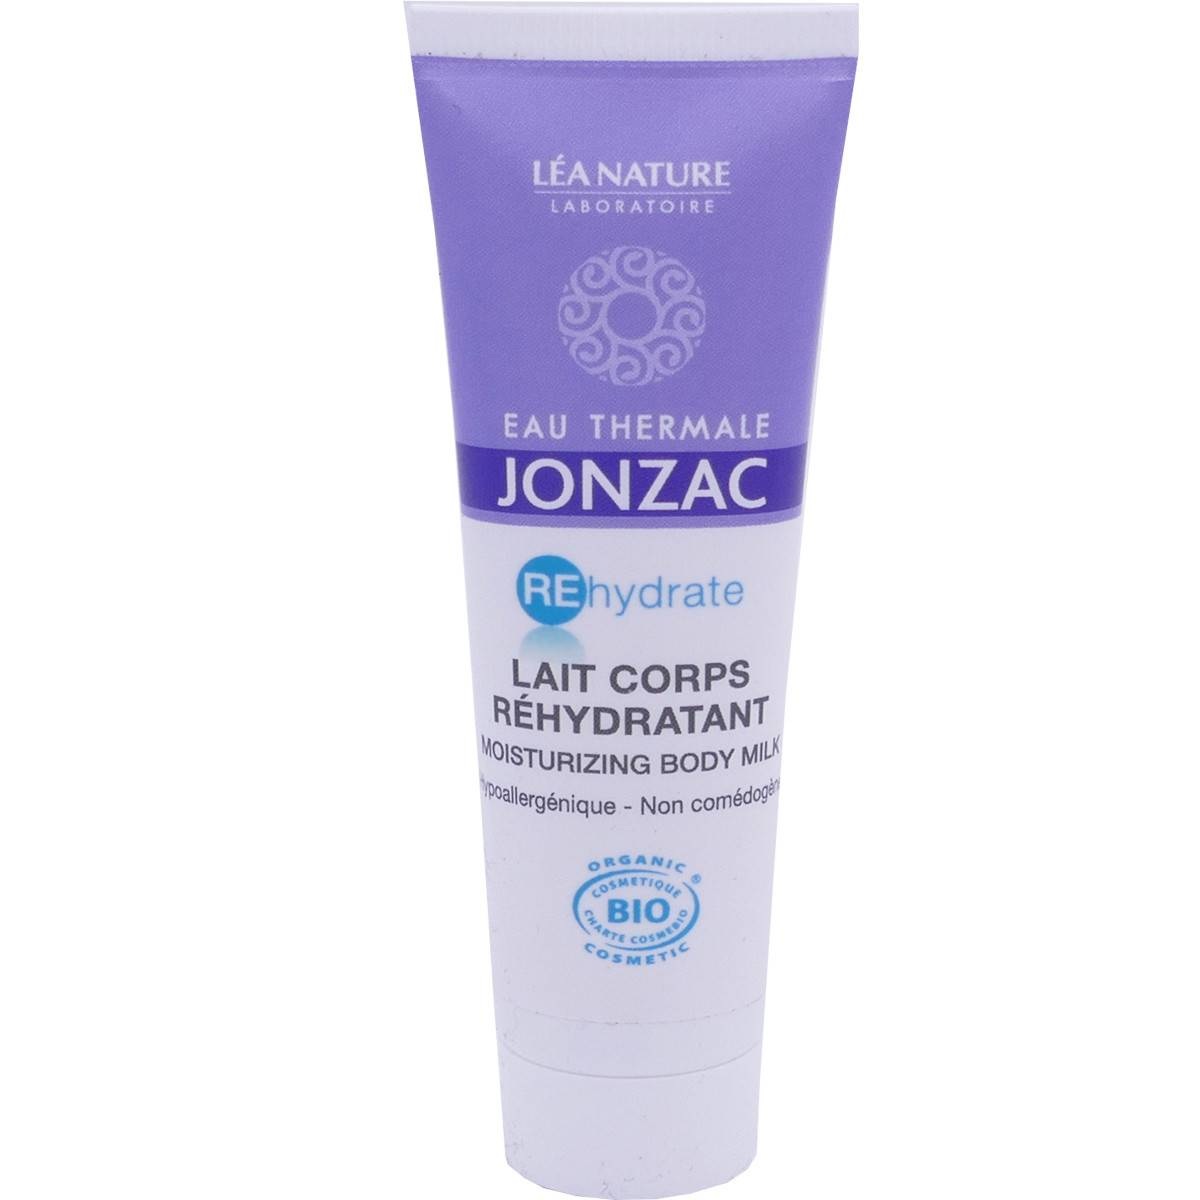 Jonzac lait corps rehydratant 30 ml bio